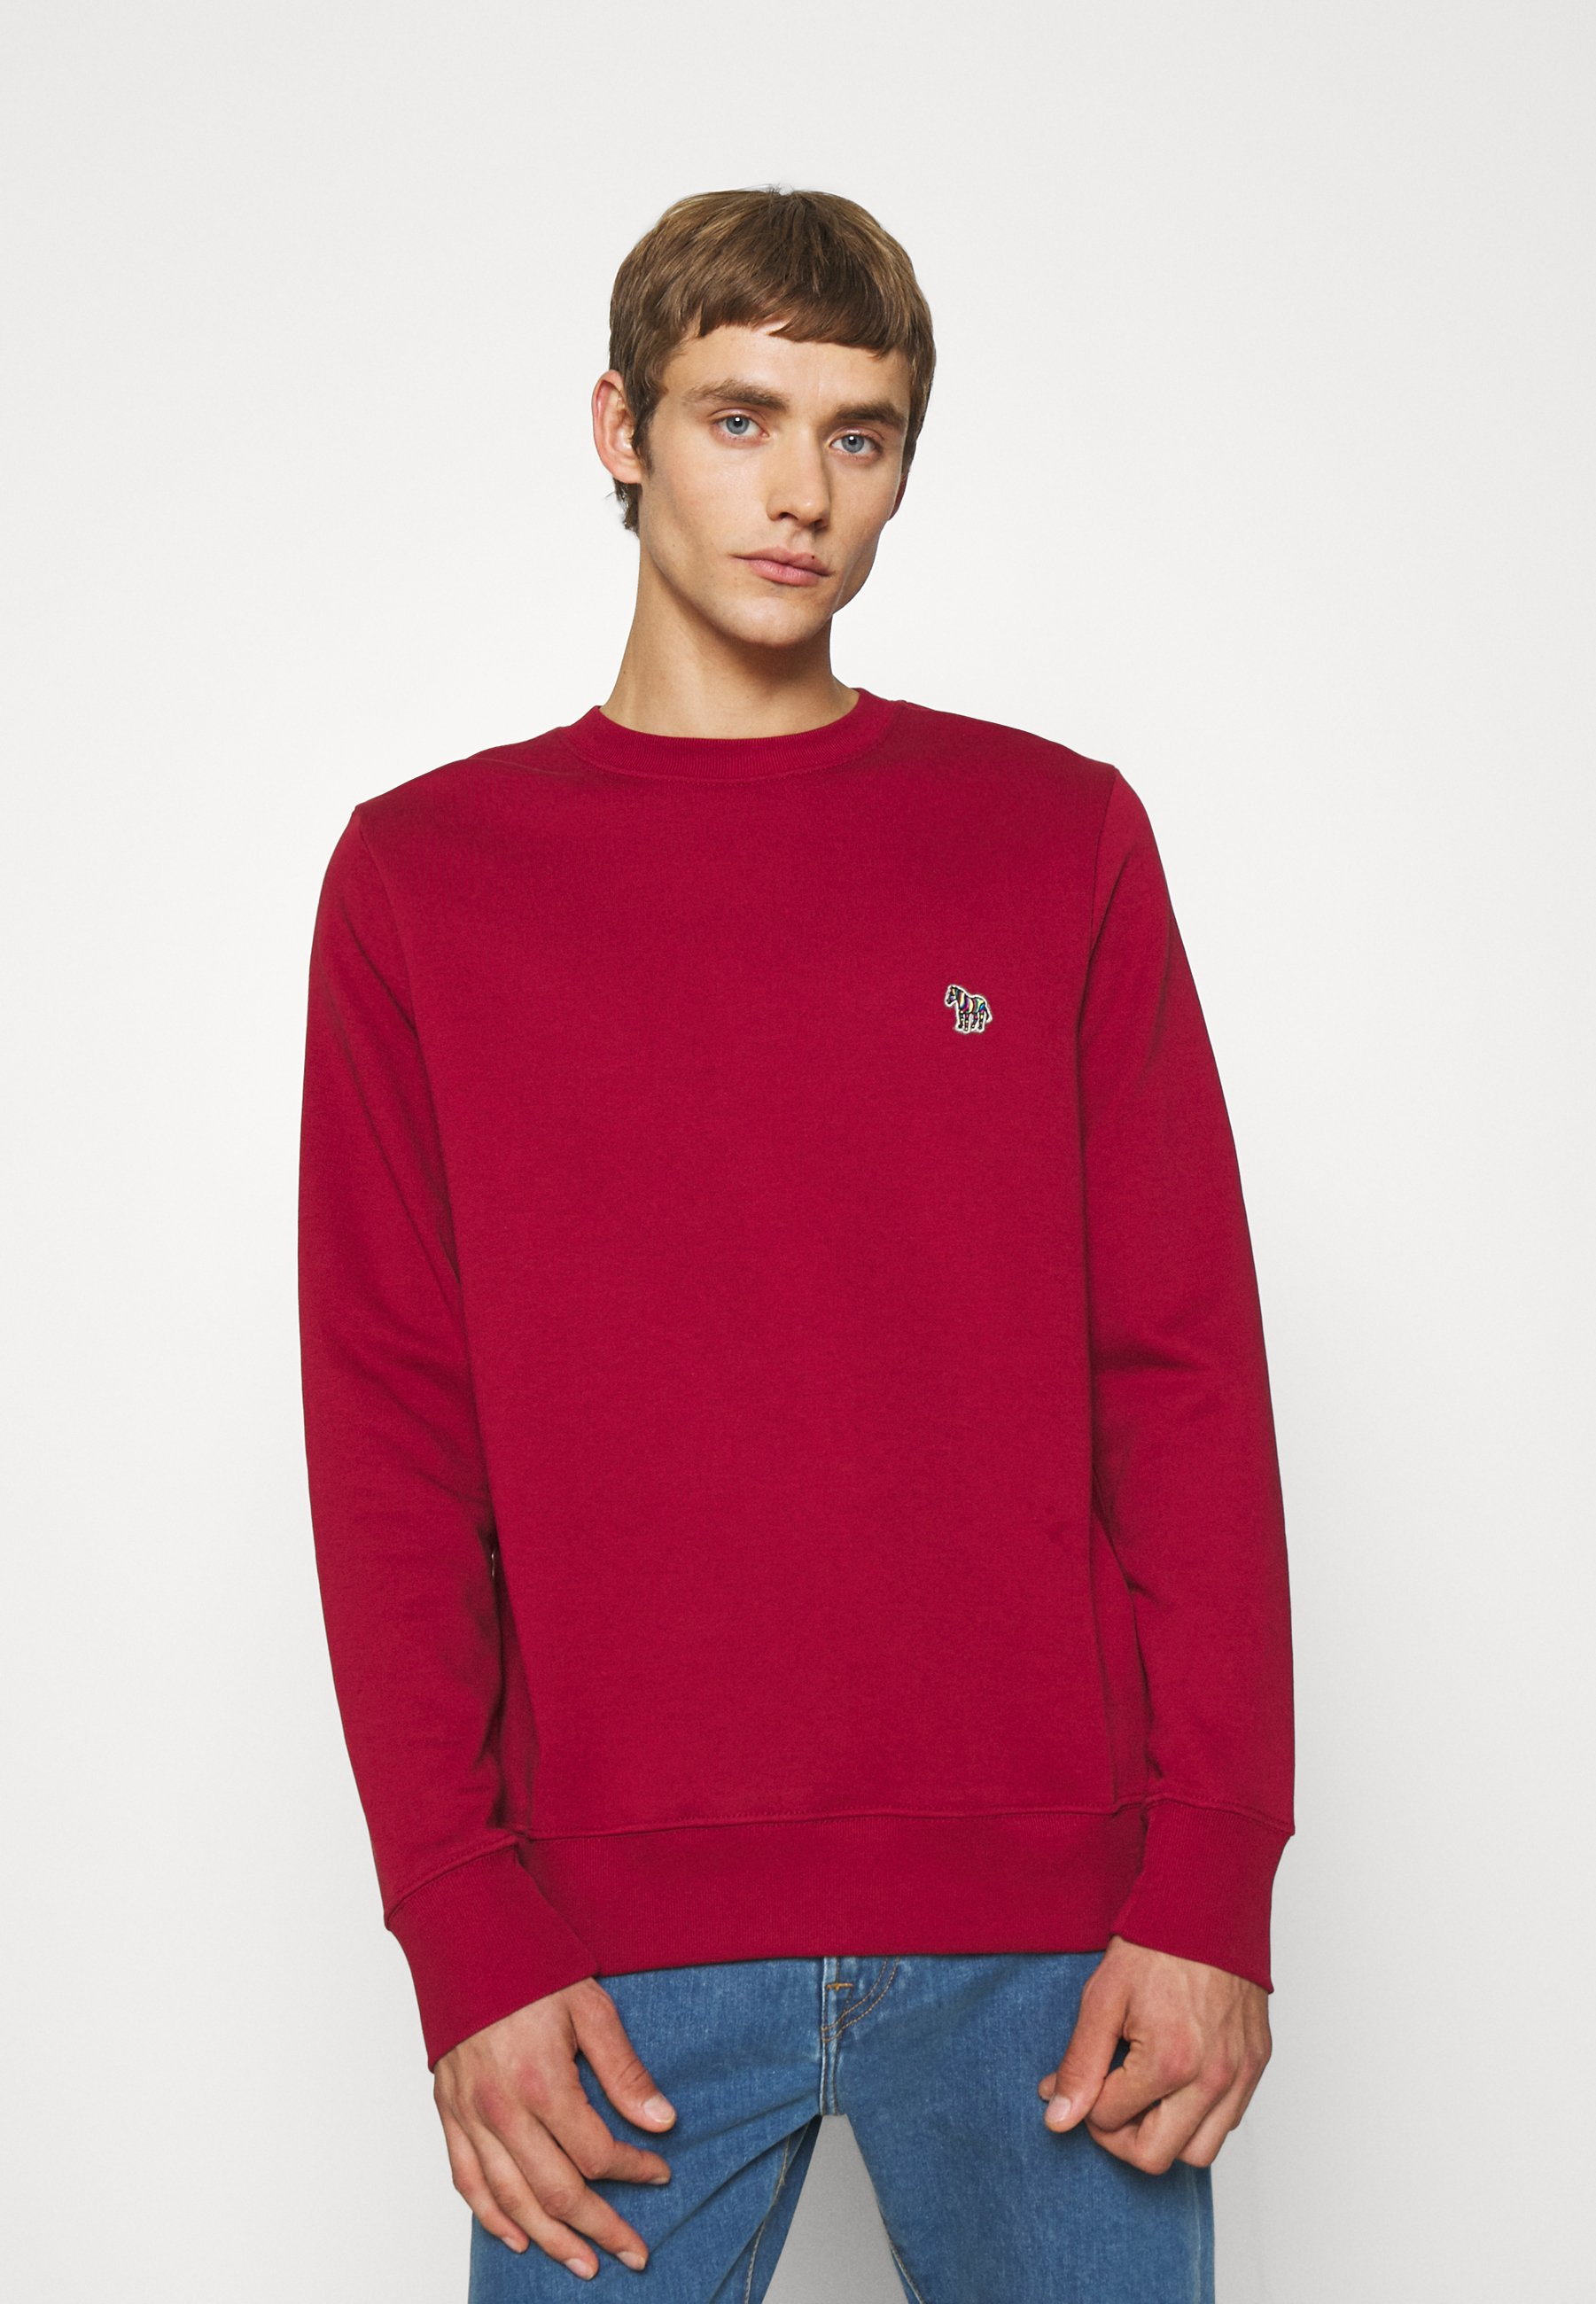 Femme REG FIT UNISEX - Sweatshirt